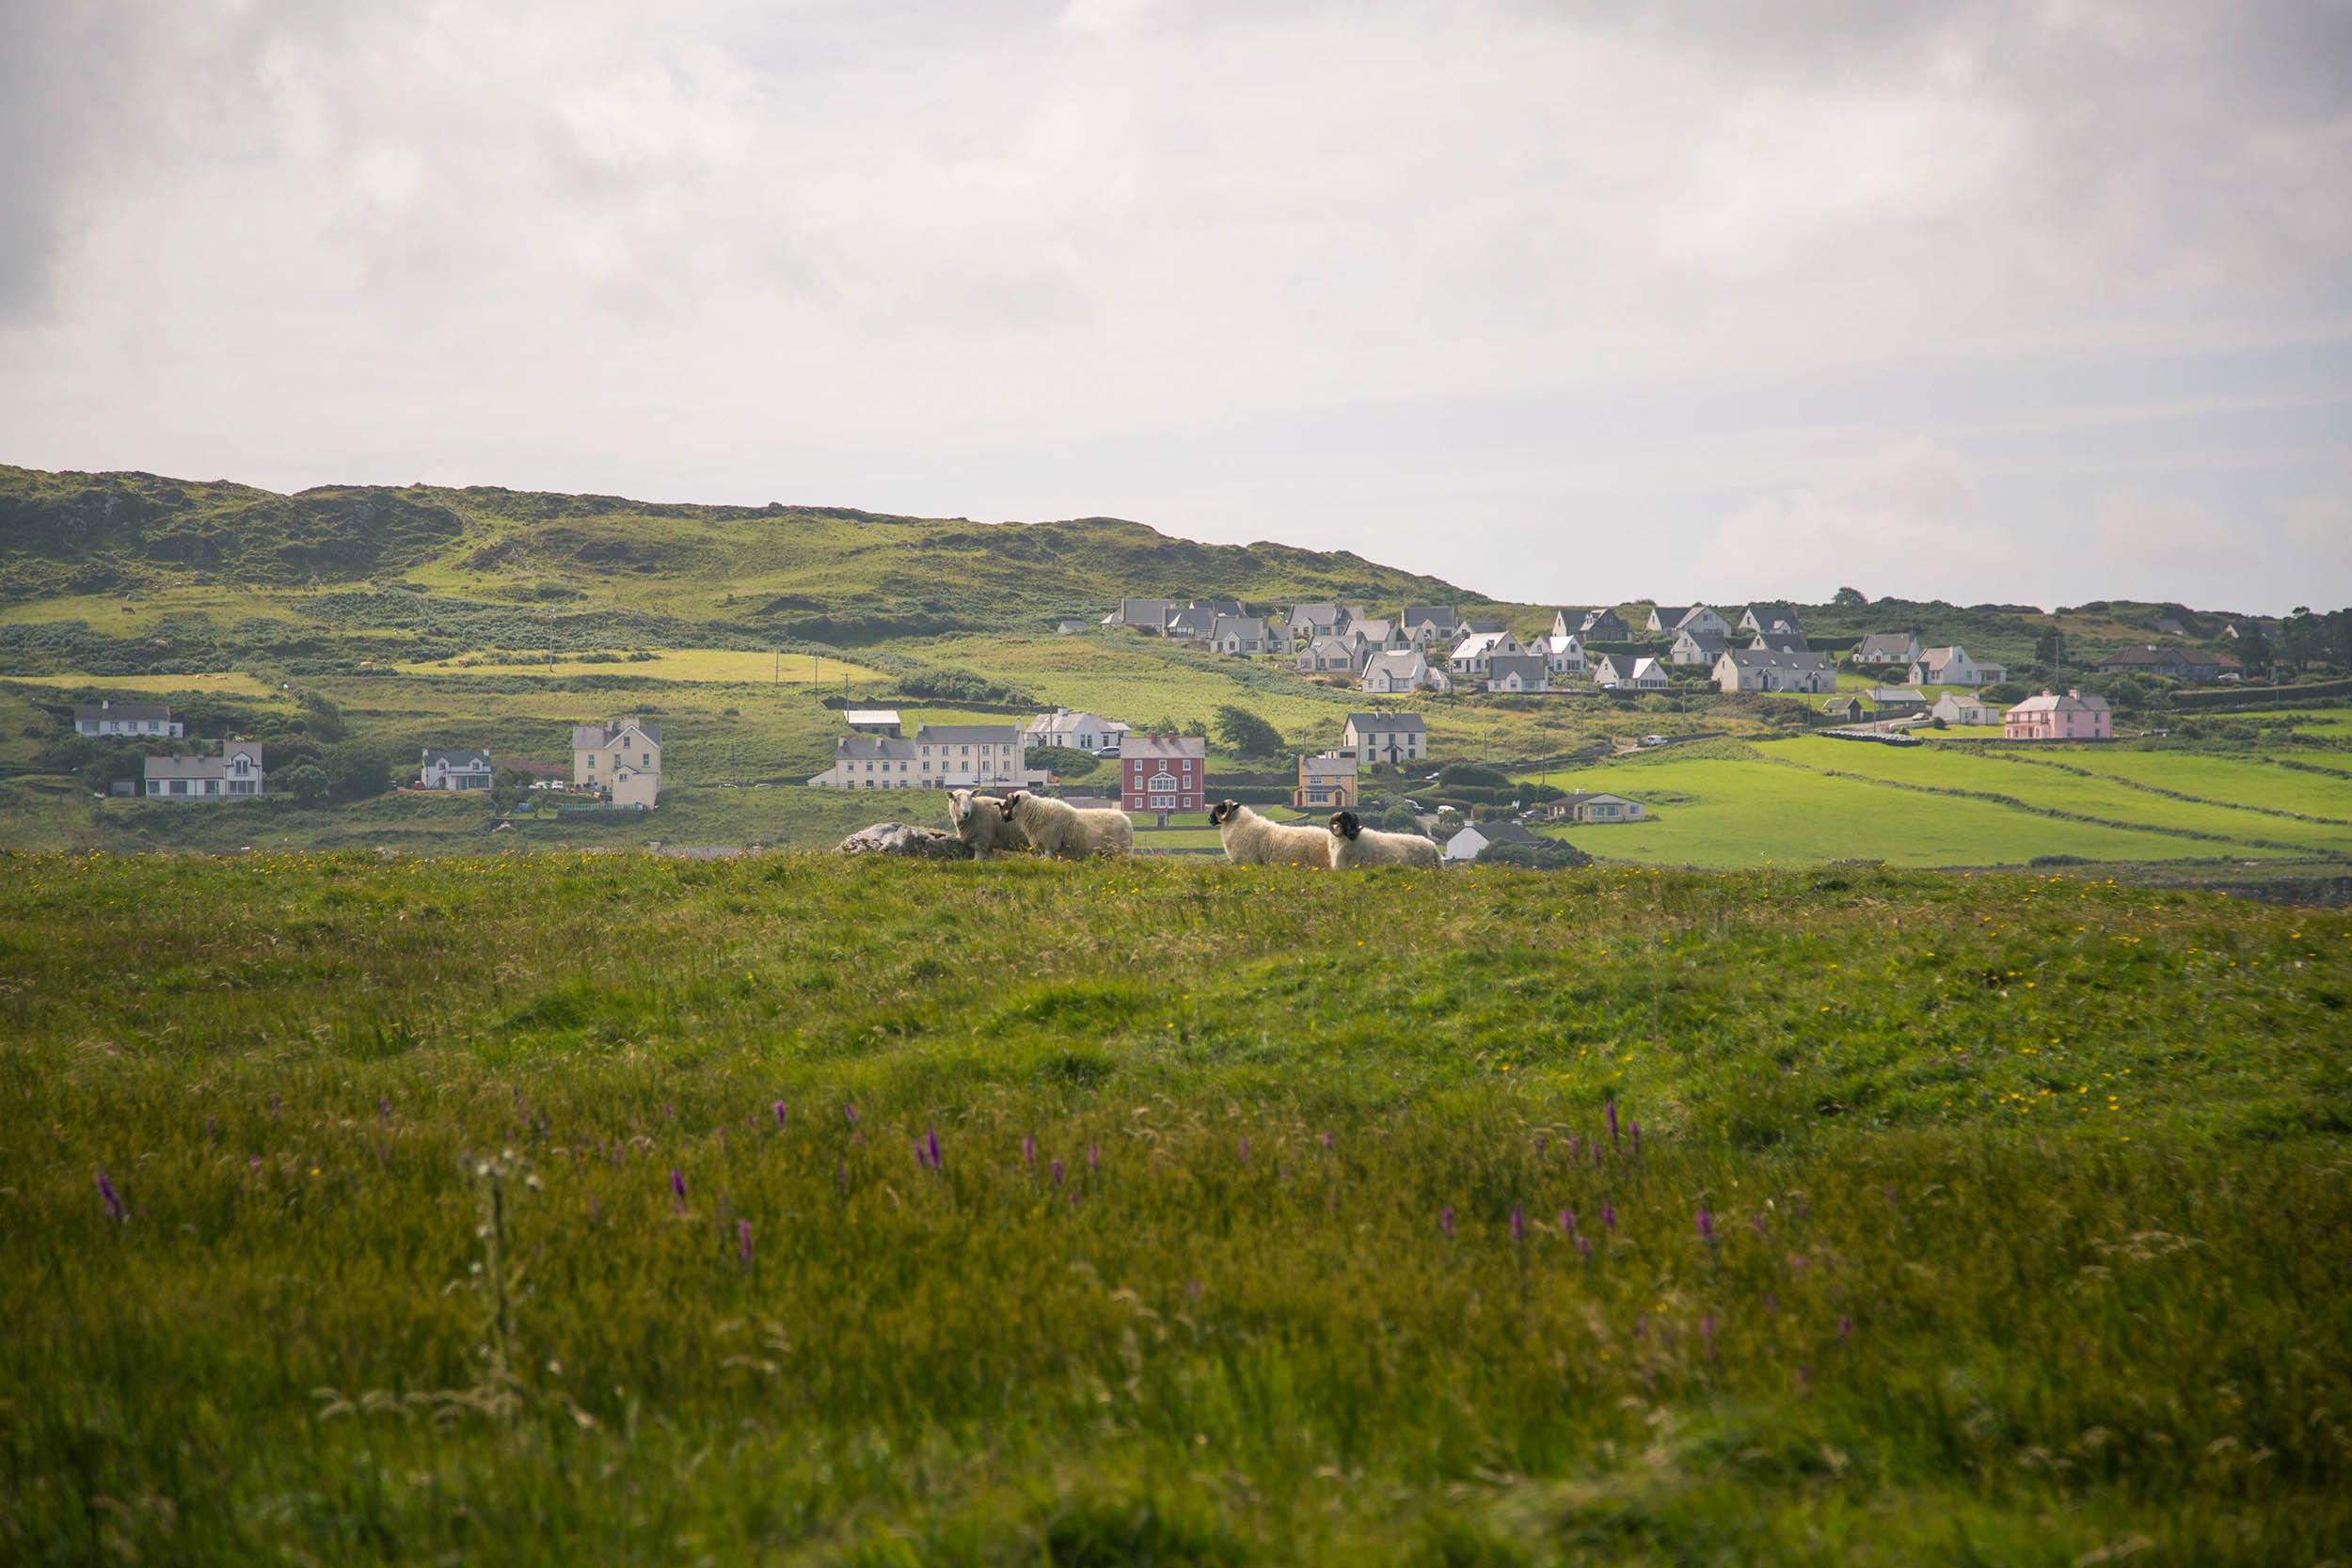 IRELAND_DONEGAL_PORTNOO_0010